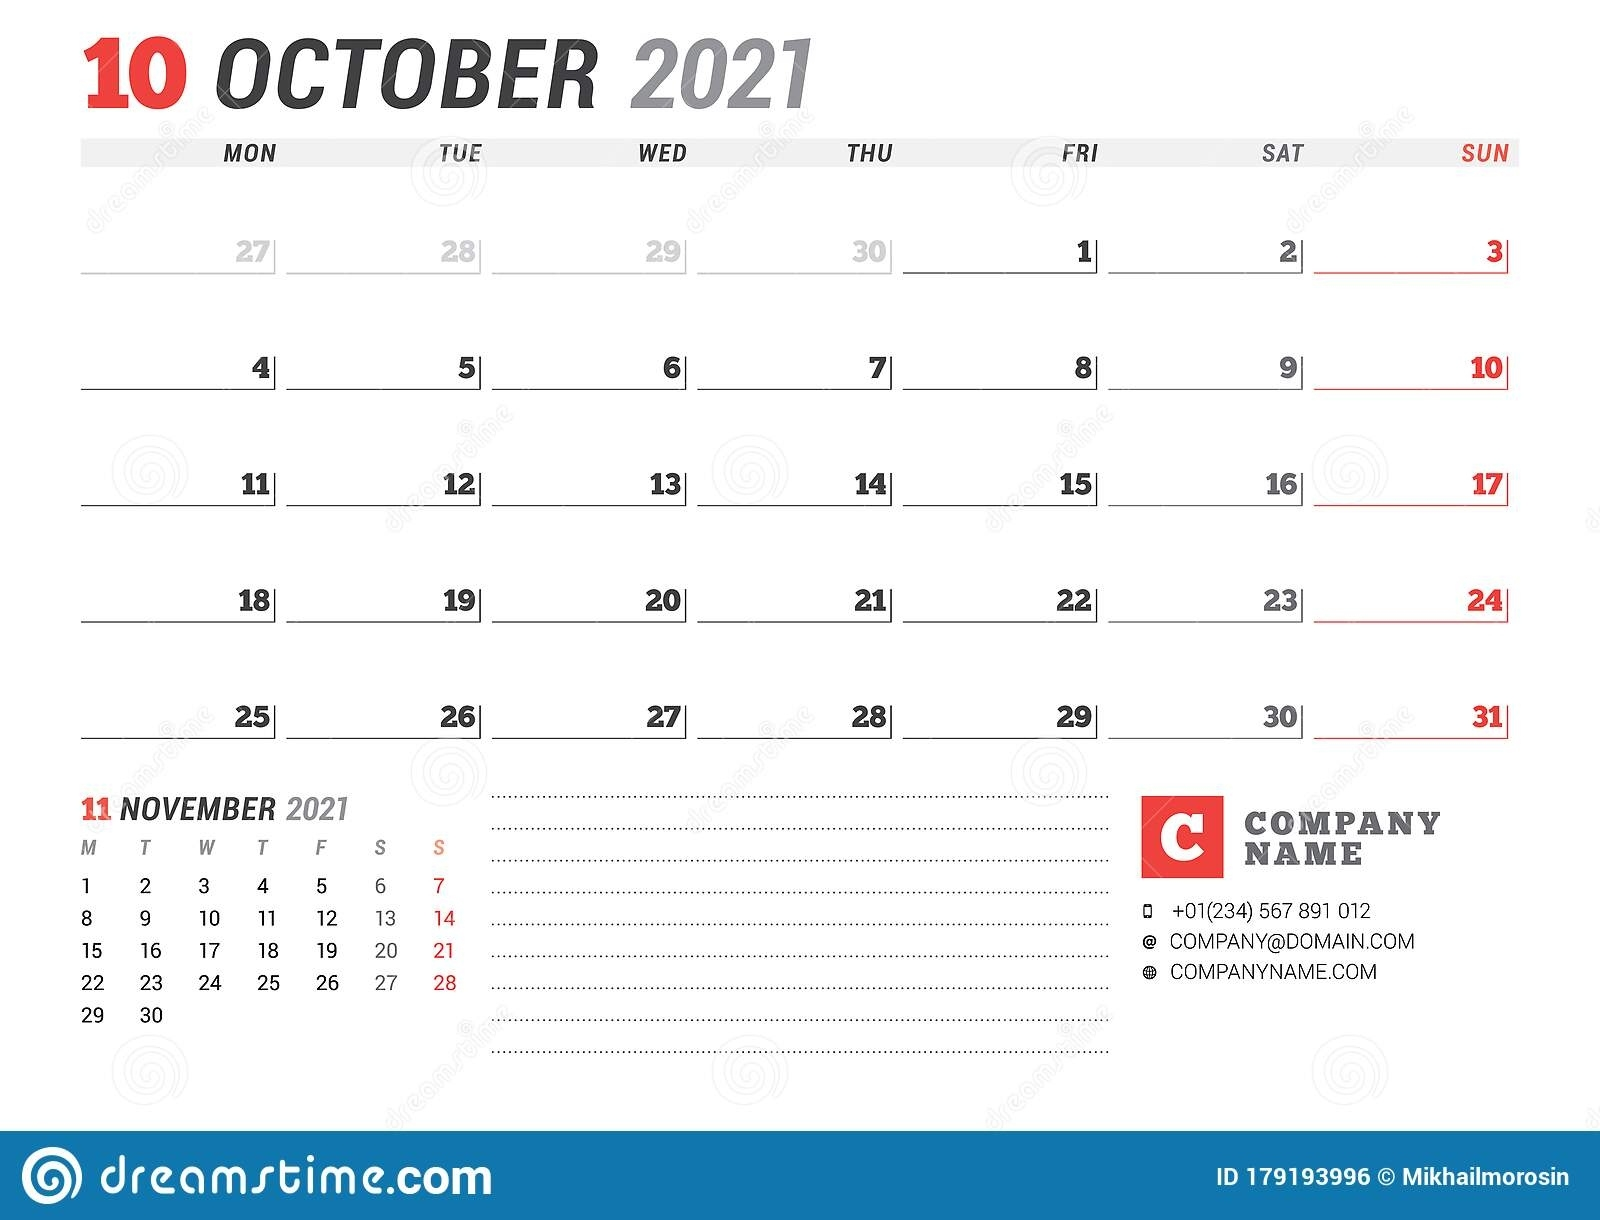 Calendar For October 2021. Business Monthly Planner. Stationery Design. Week Starts On Monday October 2021 Calendar Starting Monday